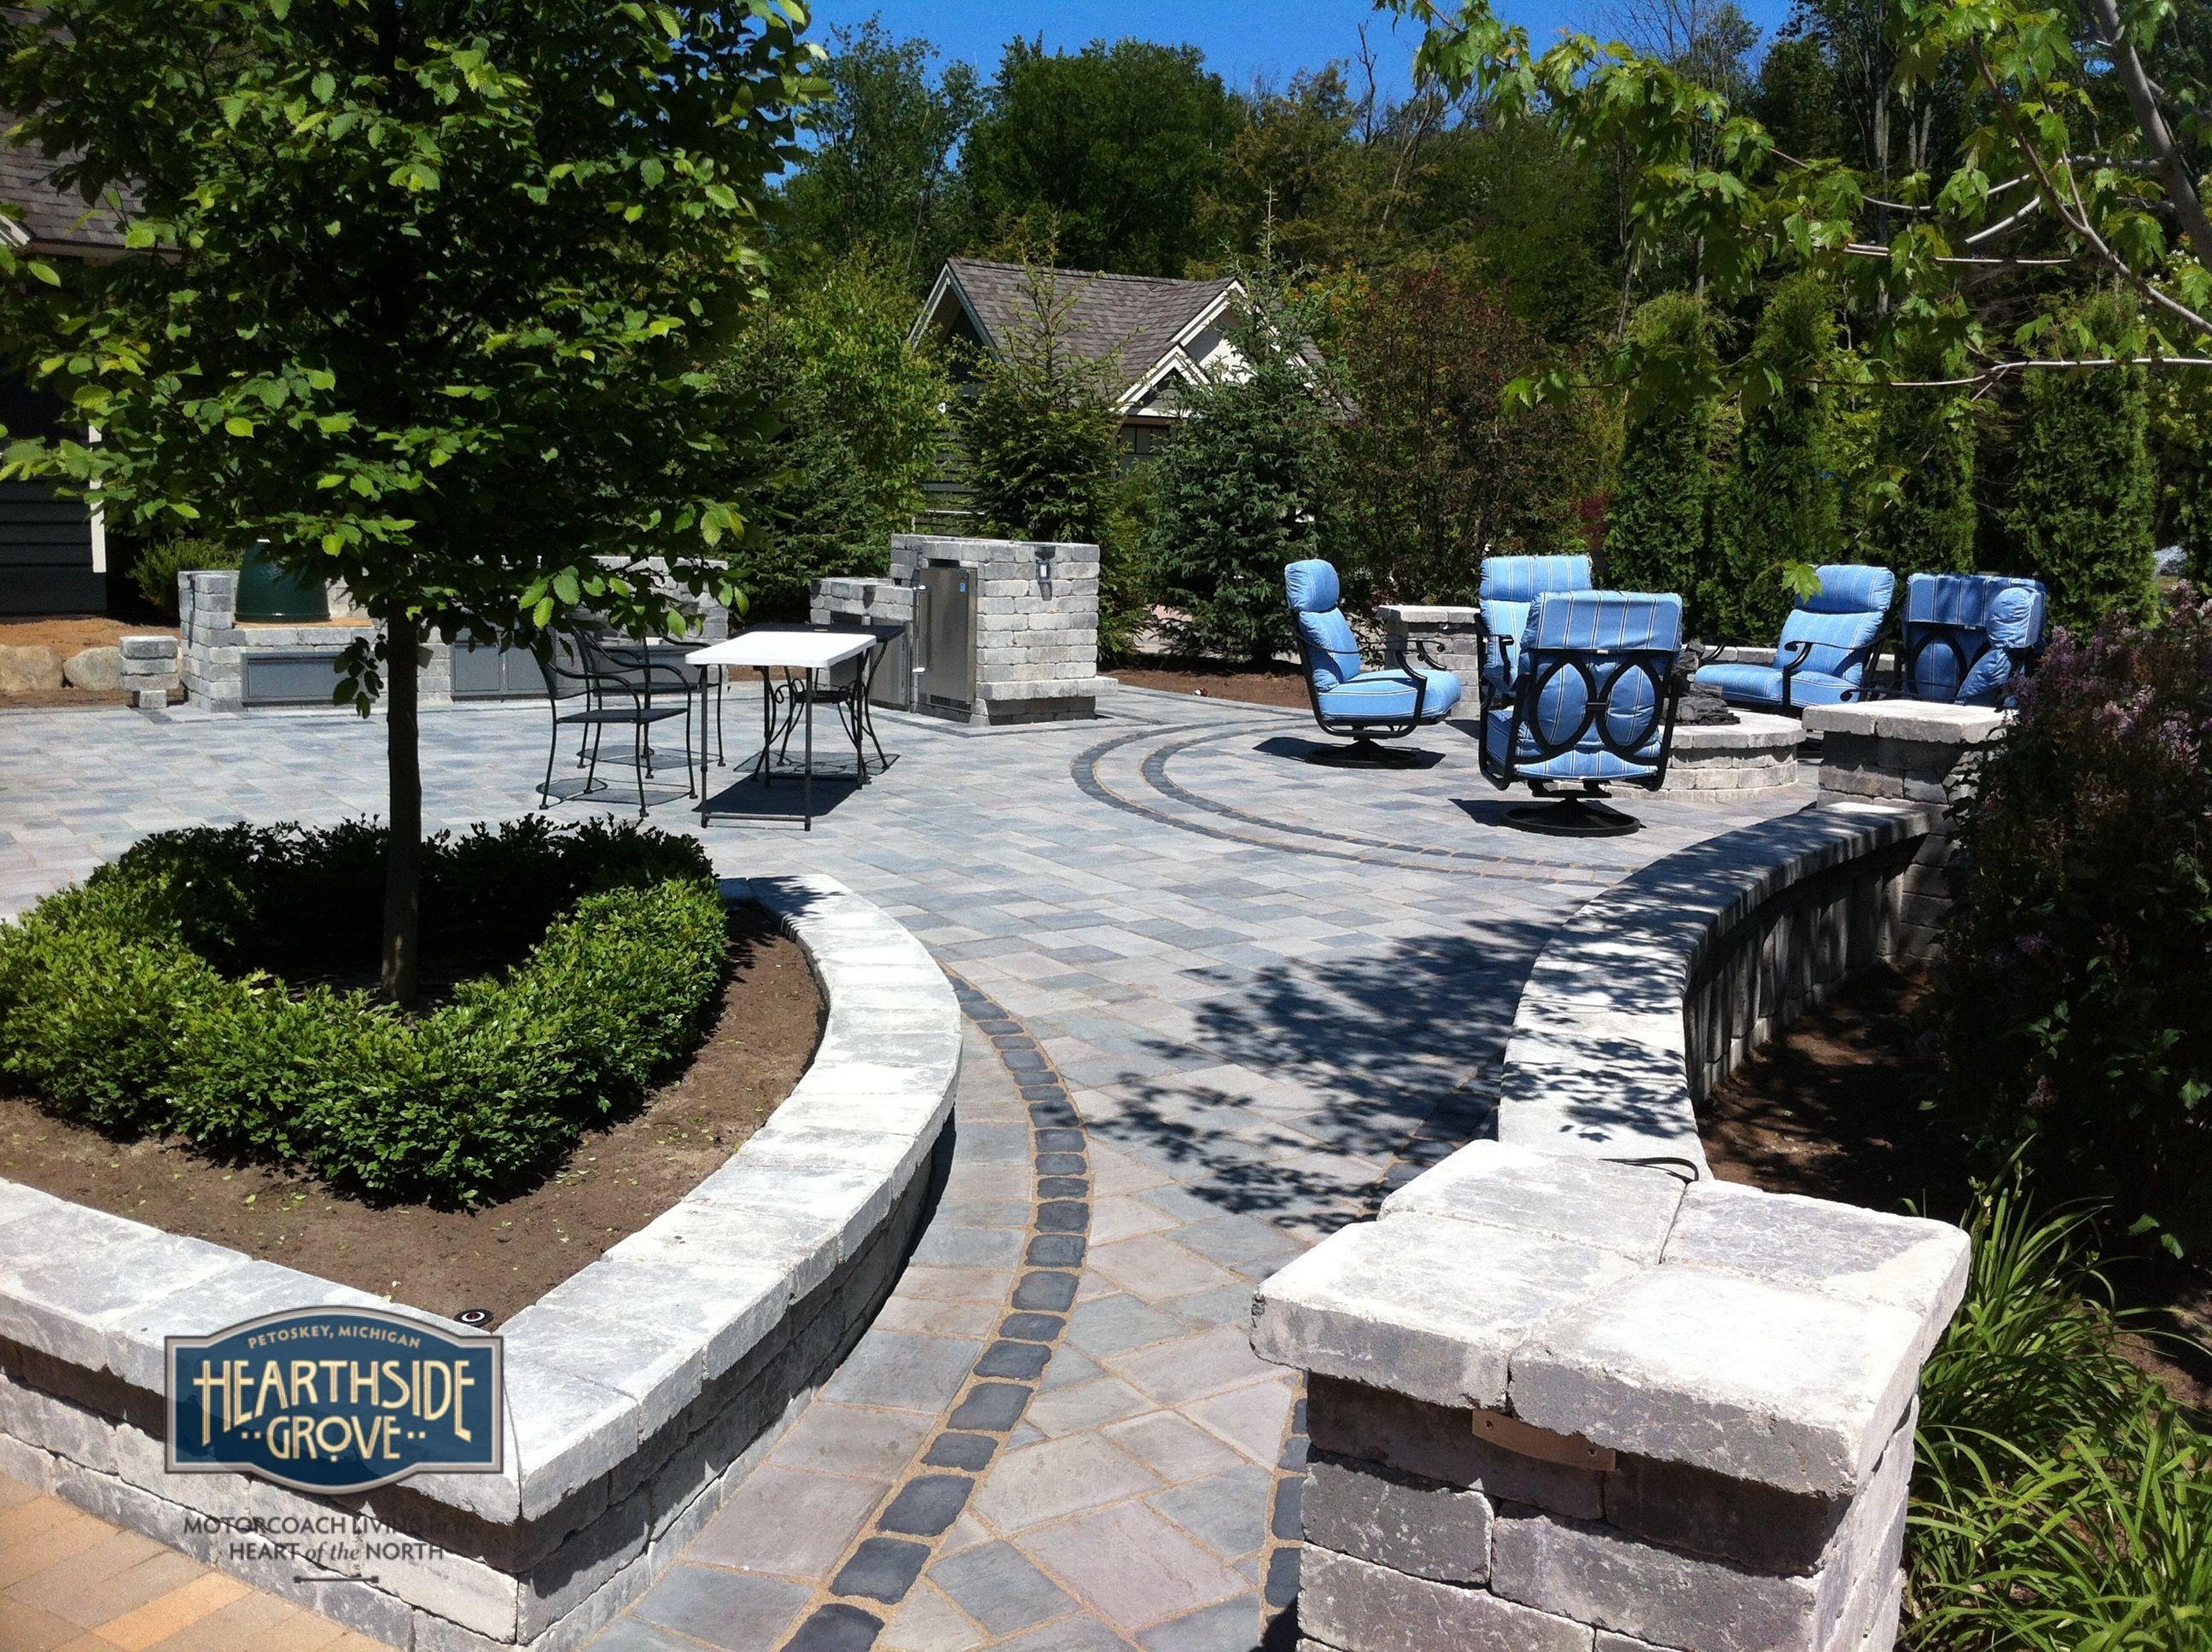 Hearthside Grove Luxury Motorcoach Resort Lot 55   #exterior #brickpavers # Patio